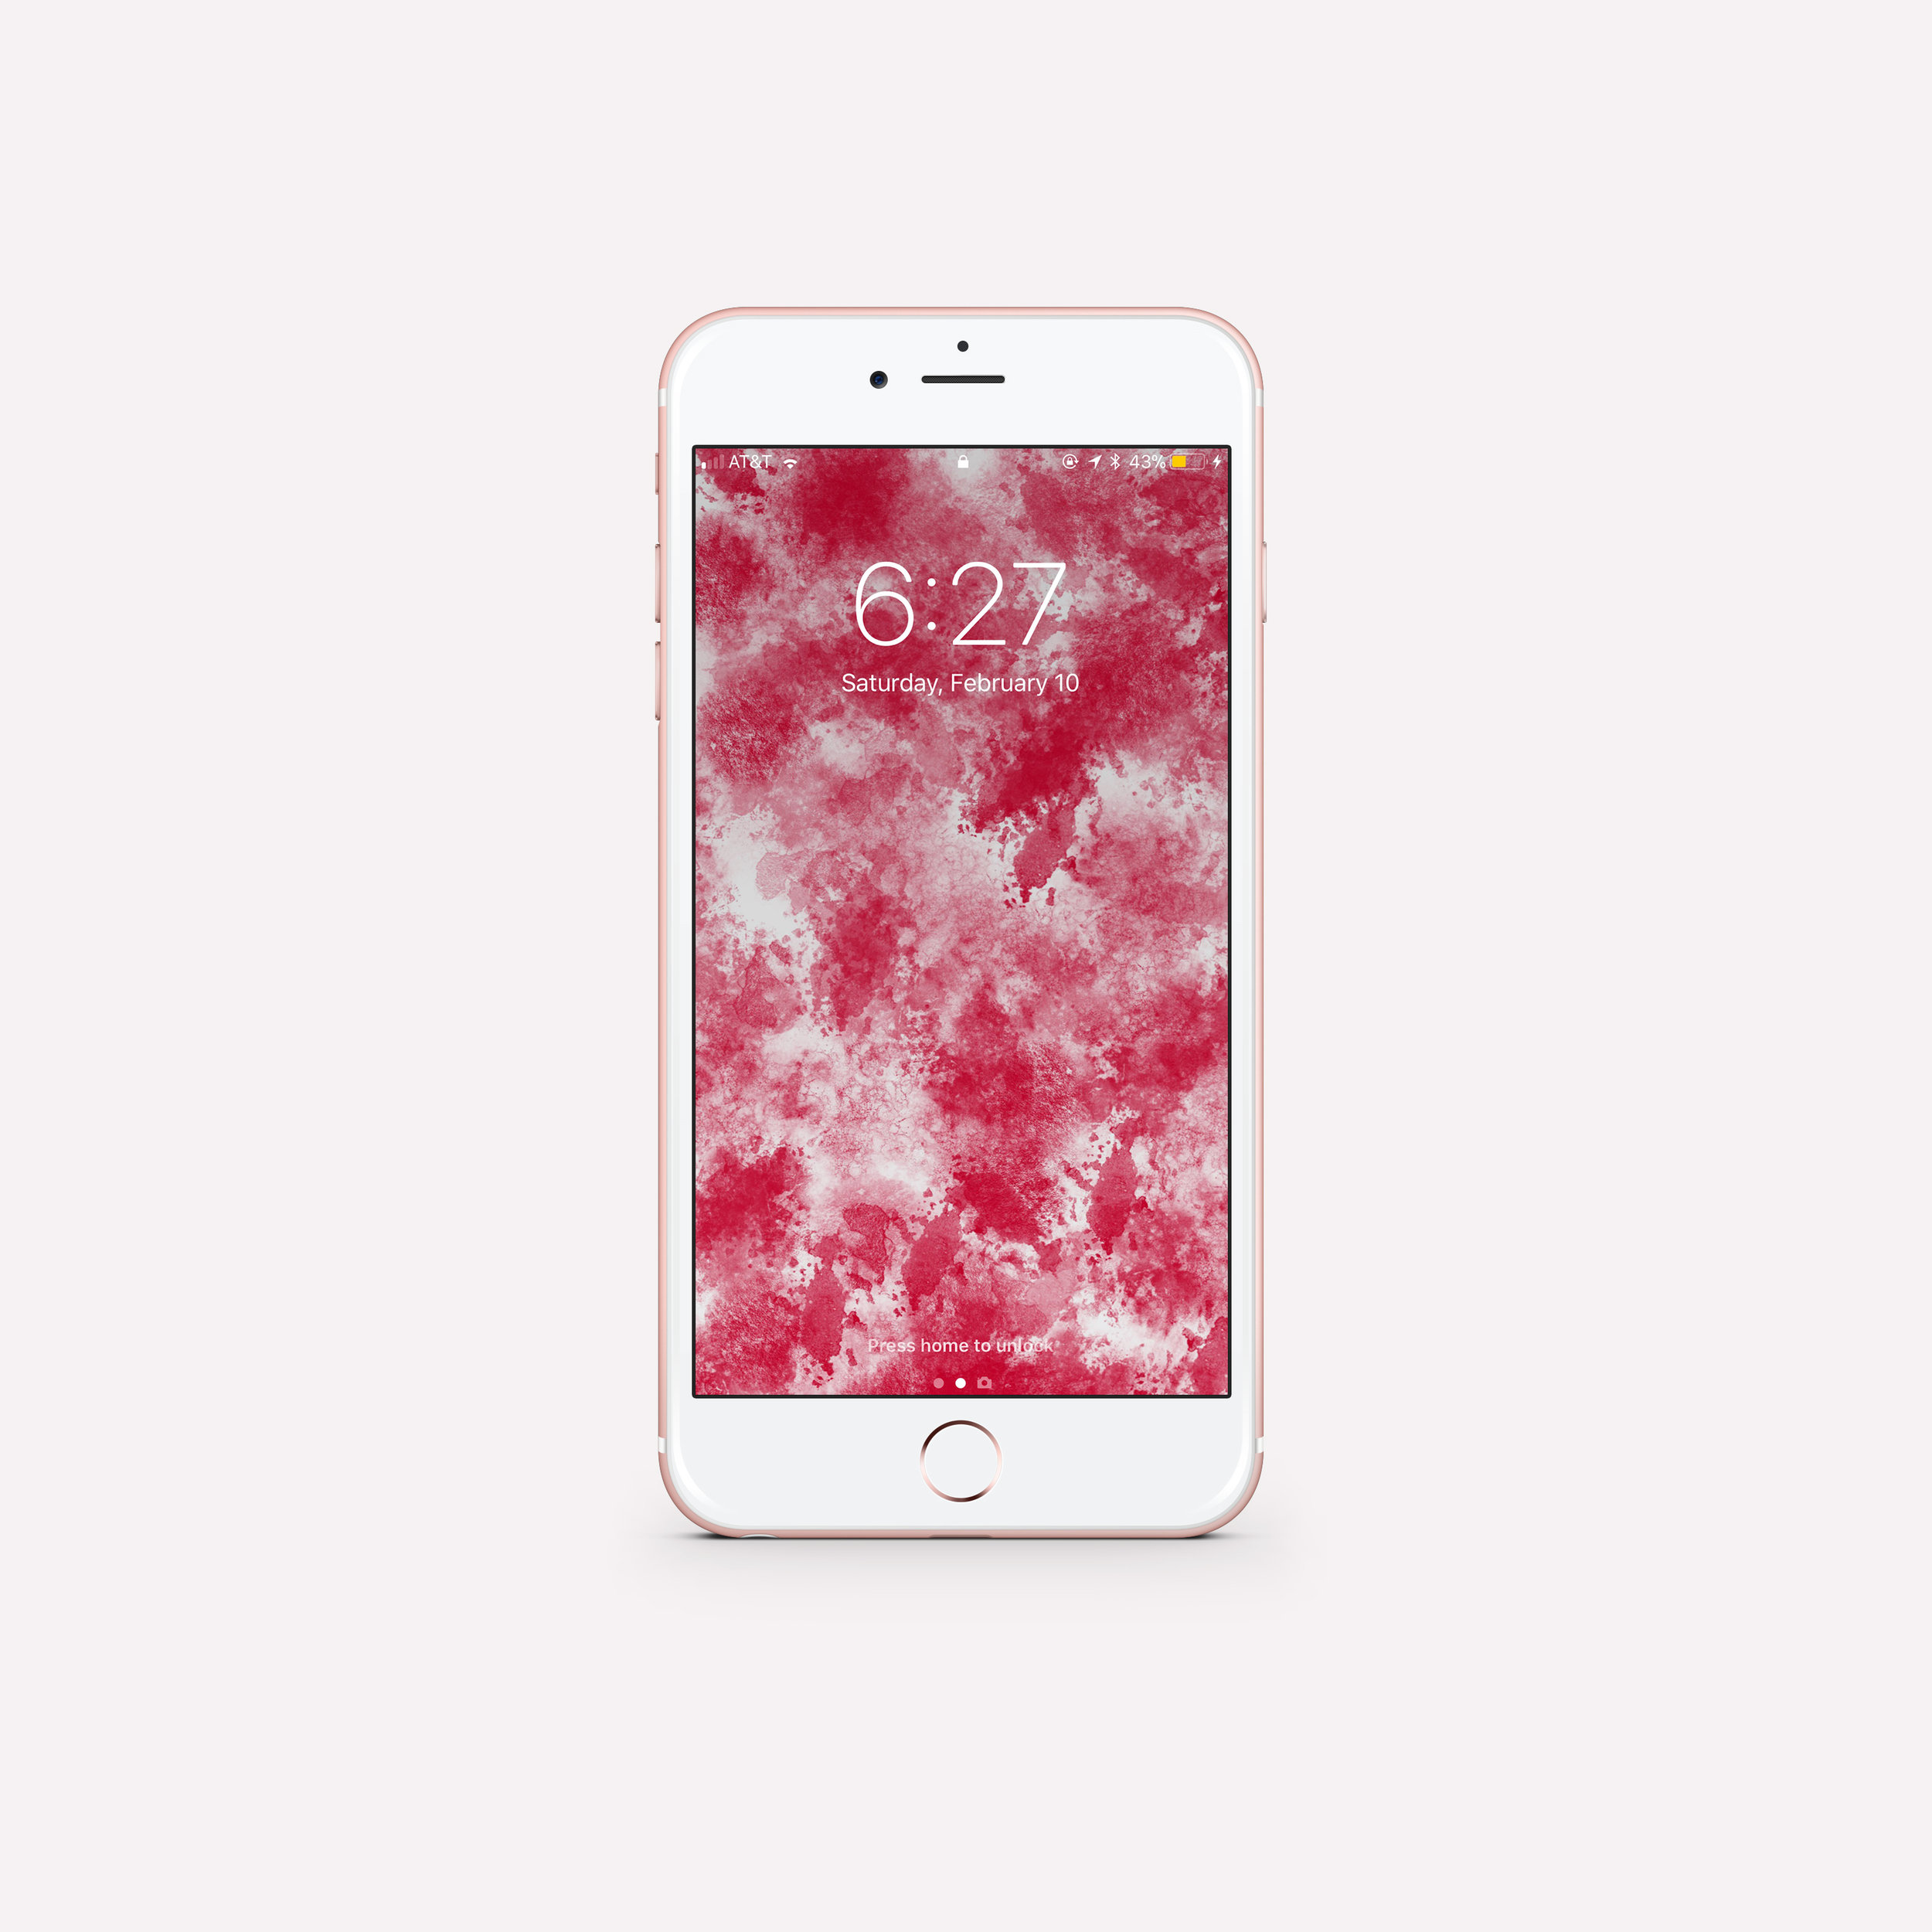 Tori Kraut Designs Iphone Wallpaper Tori Krautstrunk